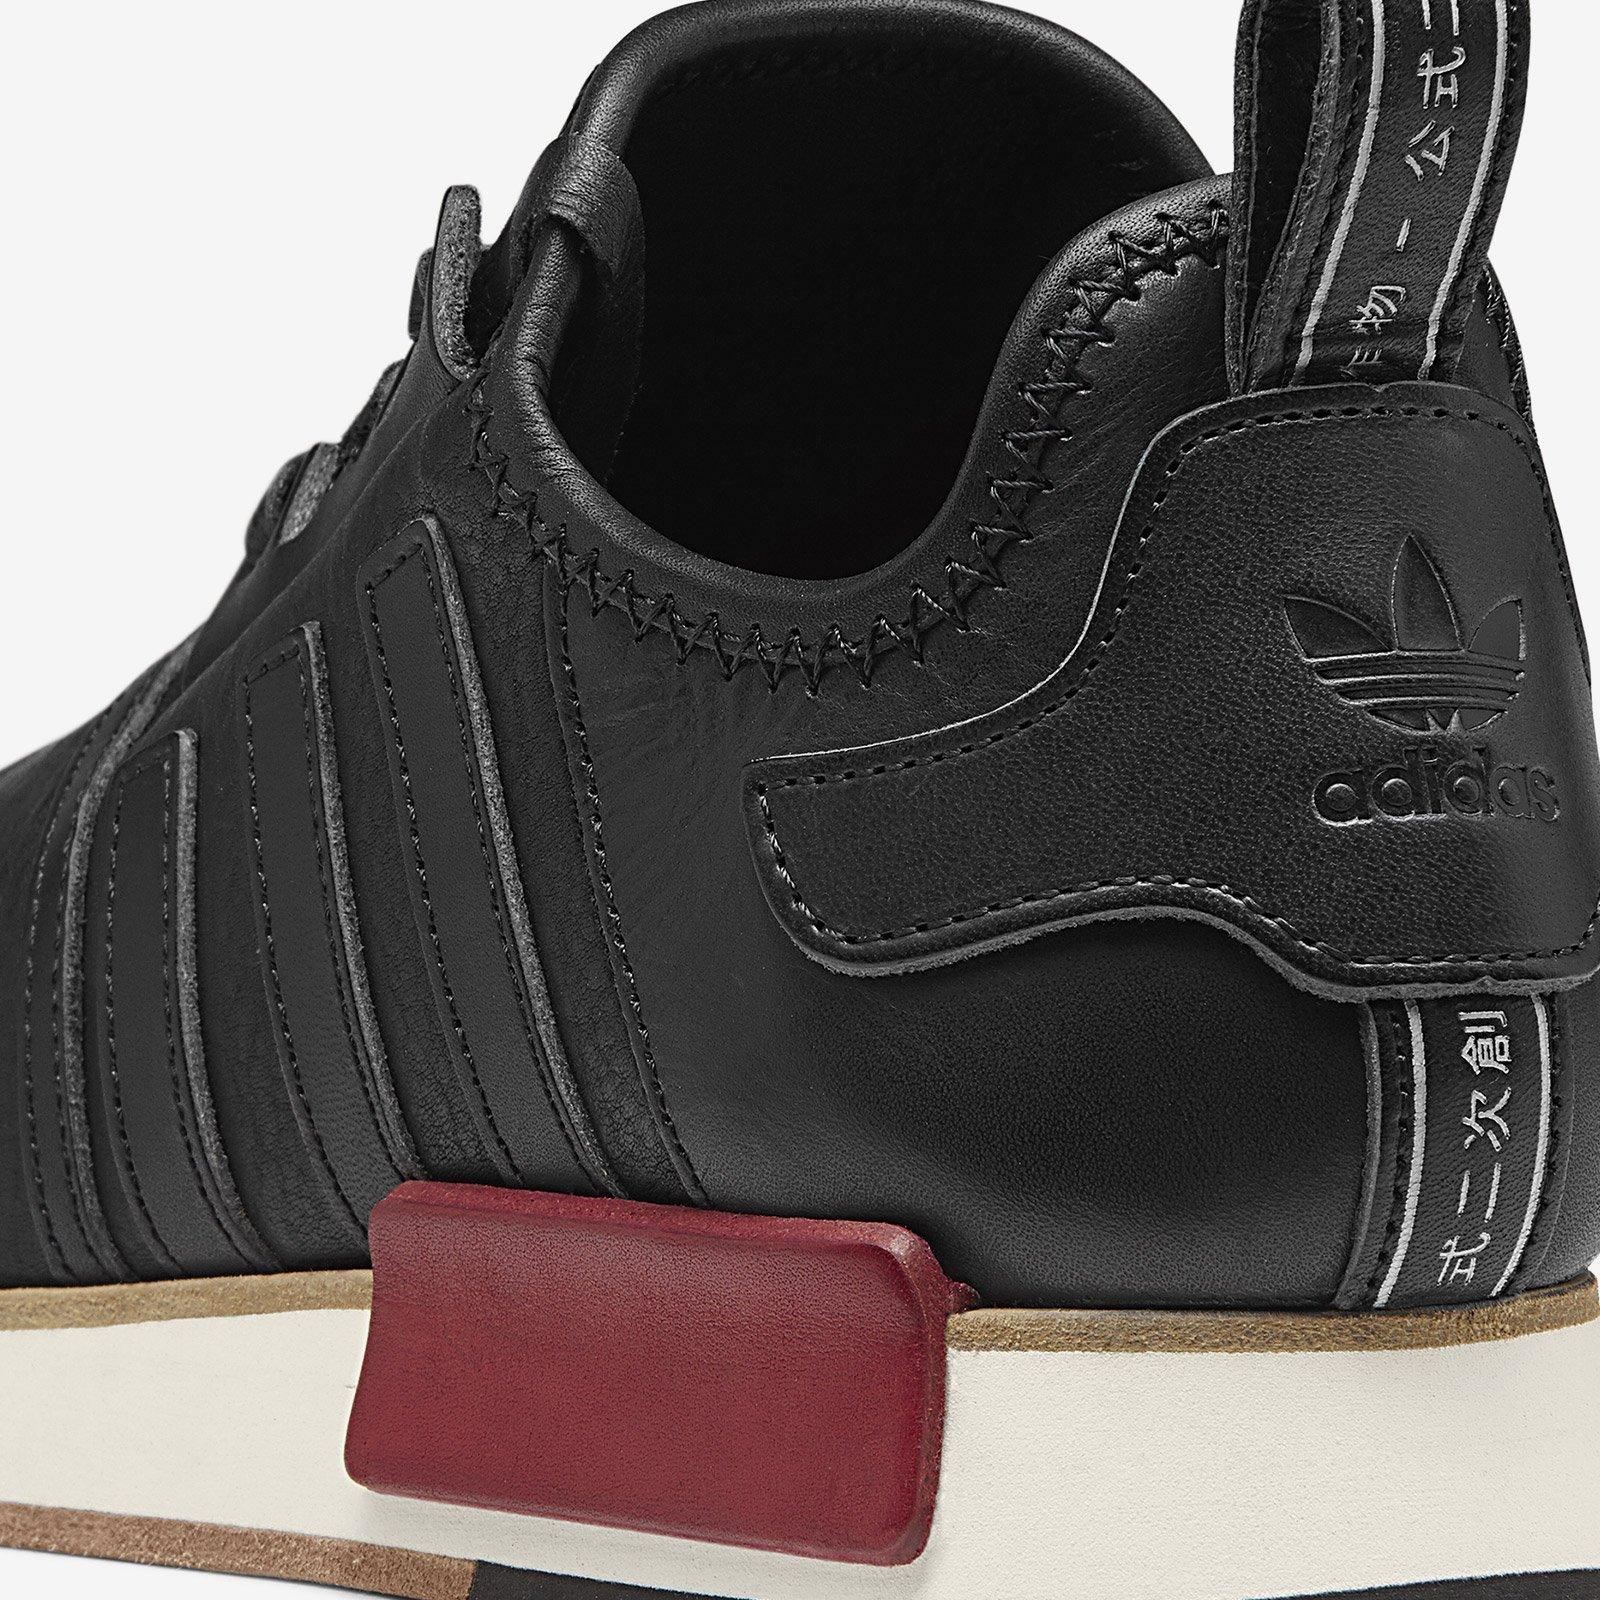 abb35330b45bb adidas Hender Scheme NMD - Cj5746 - Sneakersnstuff